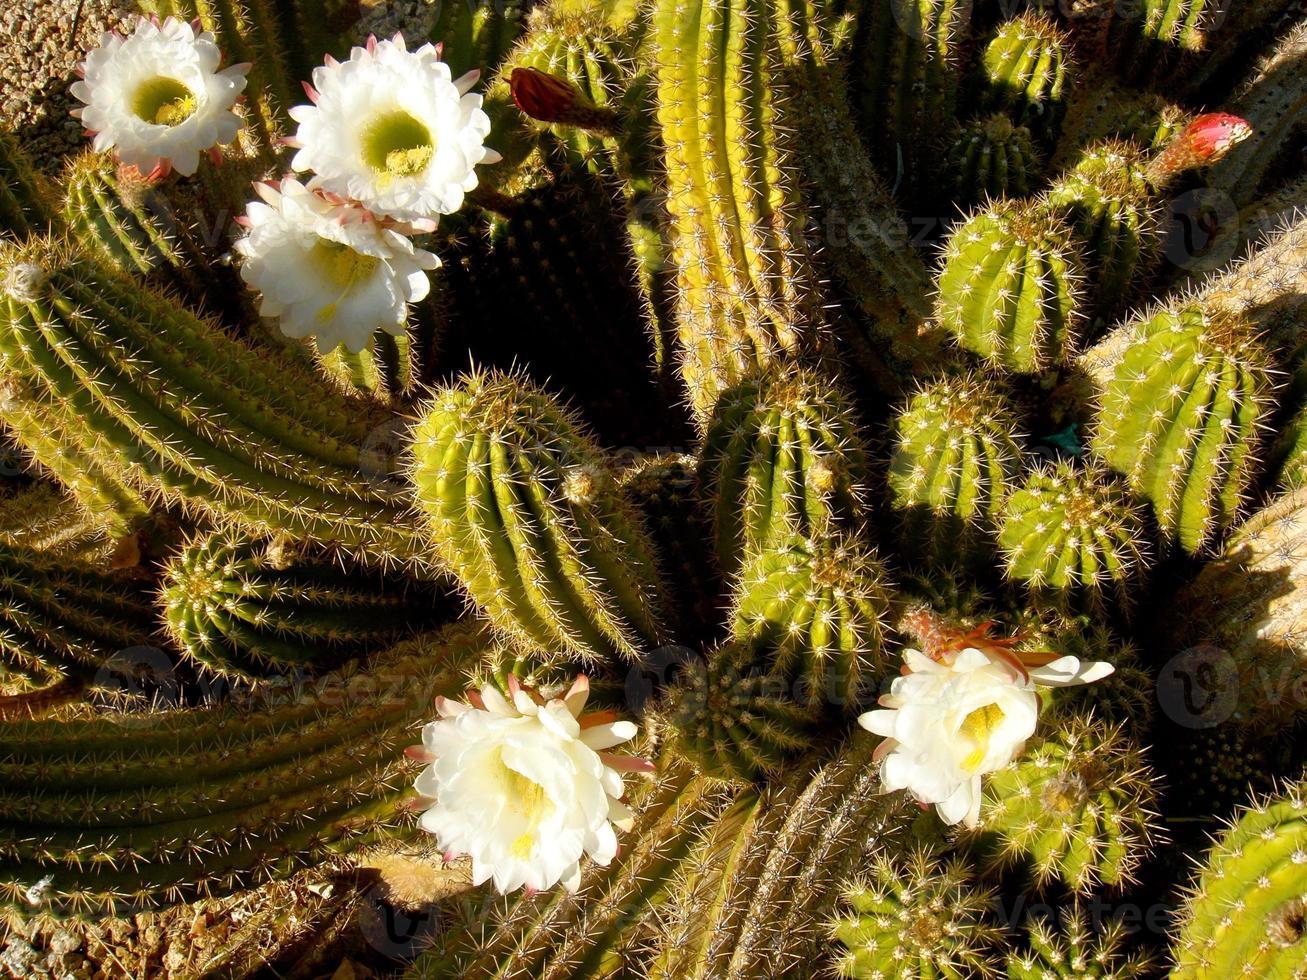 vit blommande pipestone-kaktus i tucson az foto